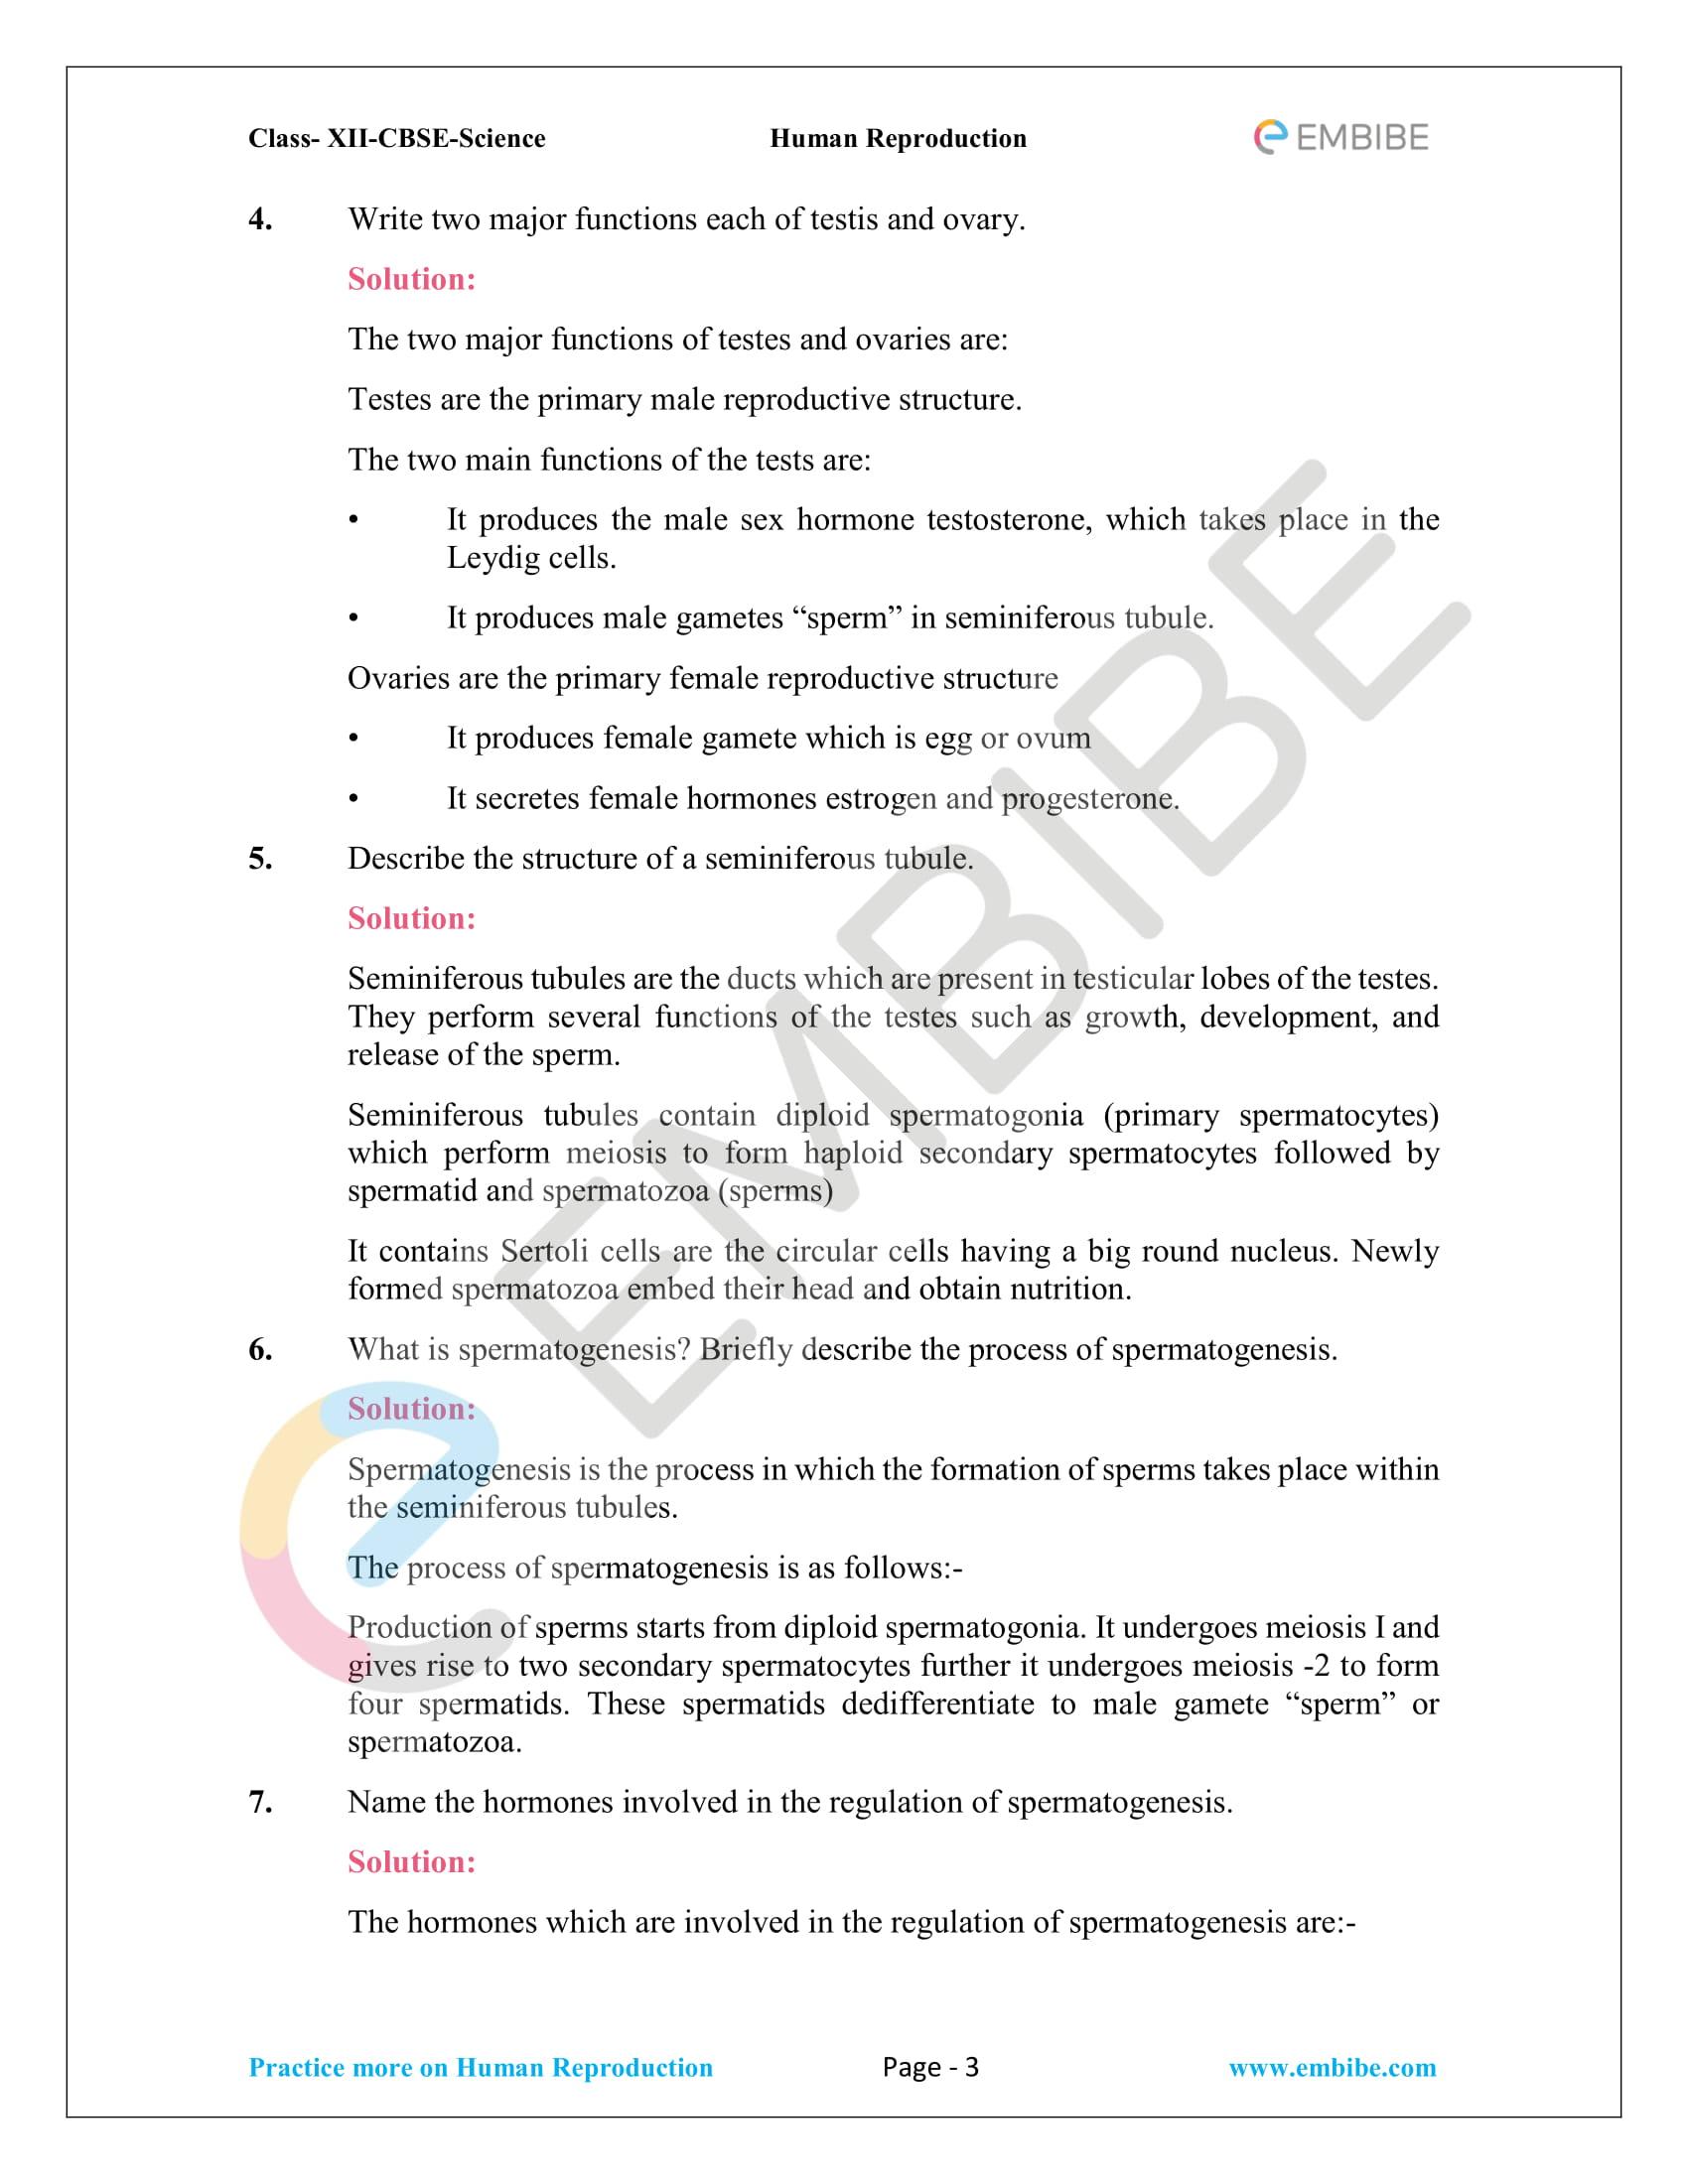 NCERT_Grade12_BOC_Biology_Human Reproduction-3